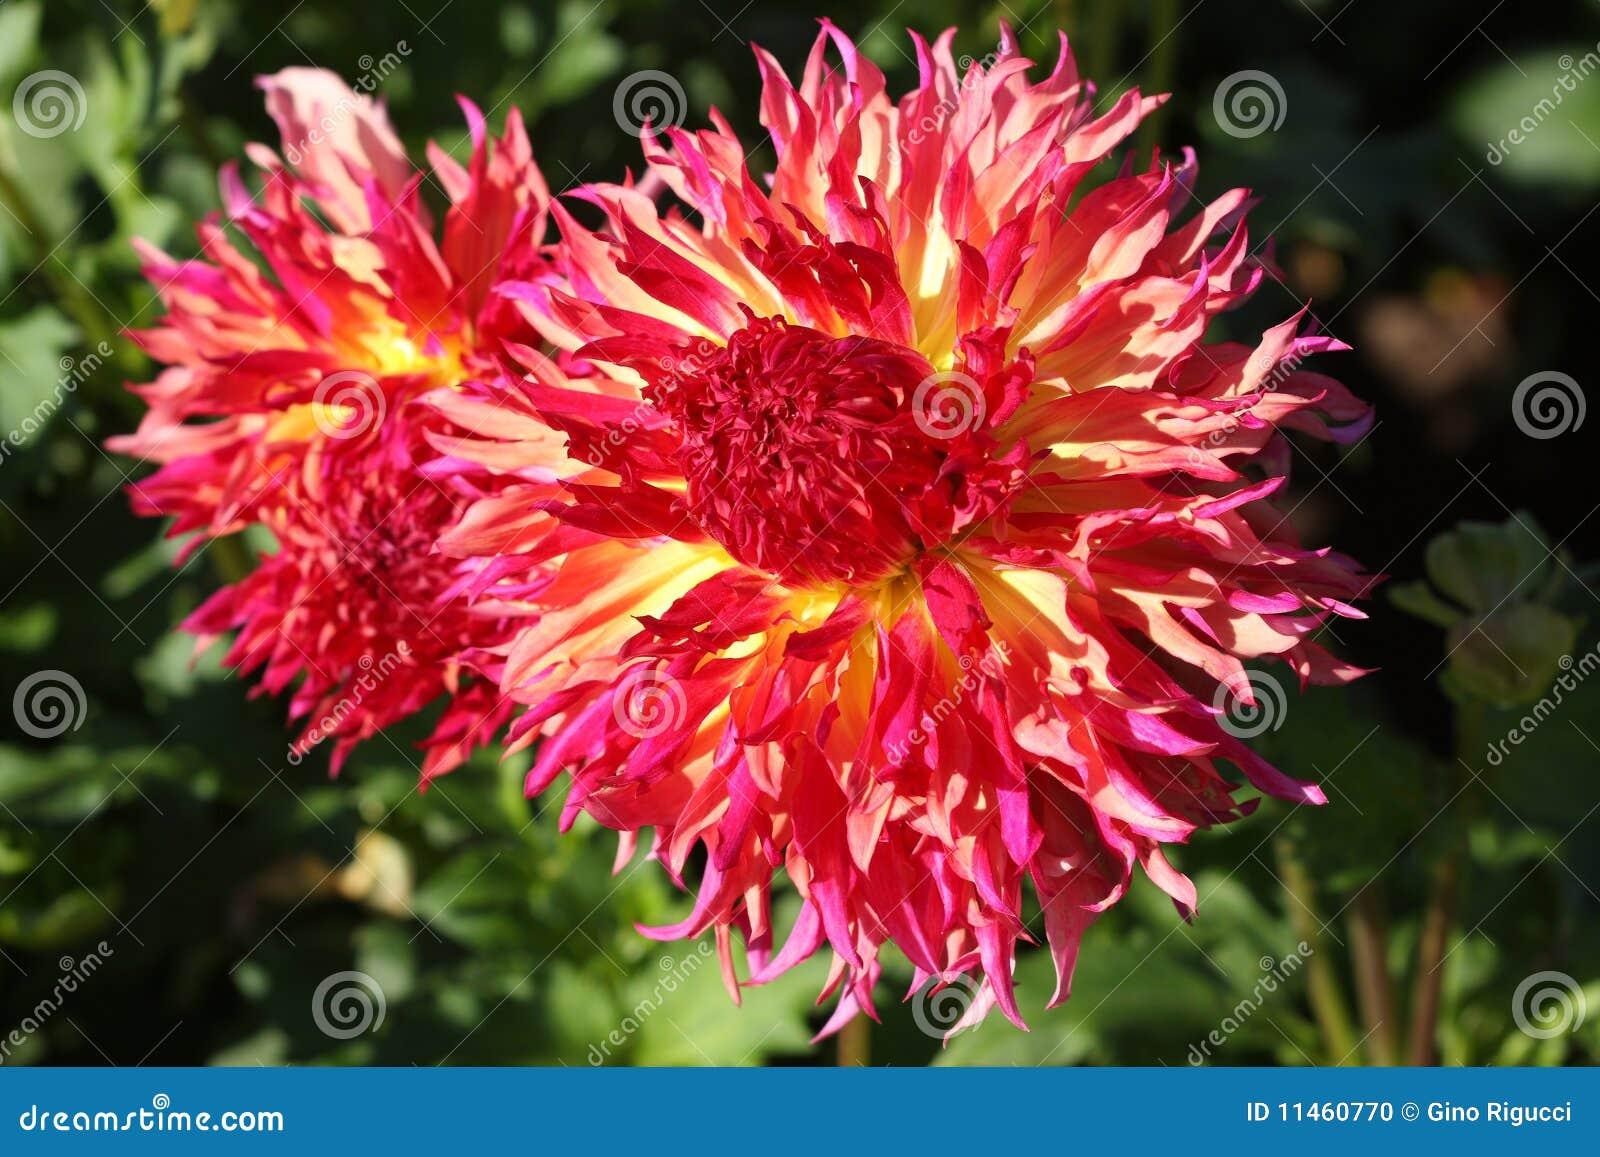 Dahlia Variety Flowers Stock Photo Image Of Flower Radiant